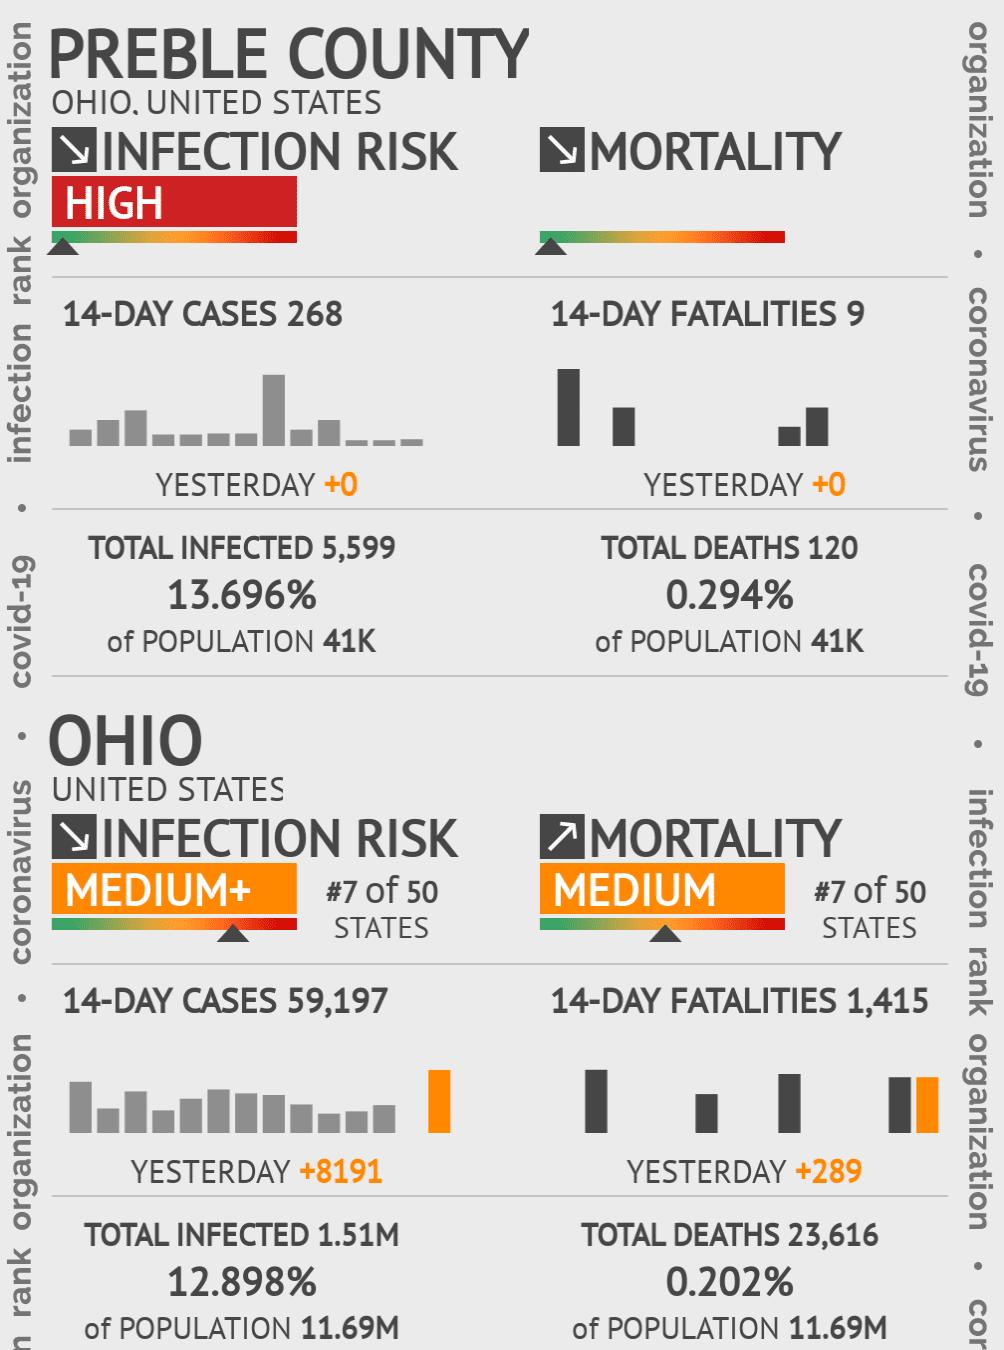 Preble County Coronavirus Covid-19 Risk of Infection on February 28, 2021